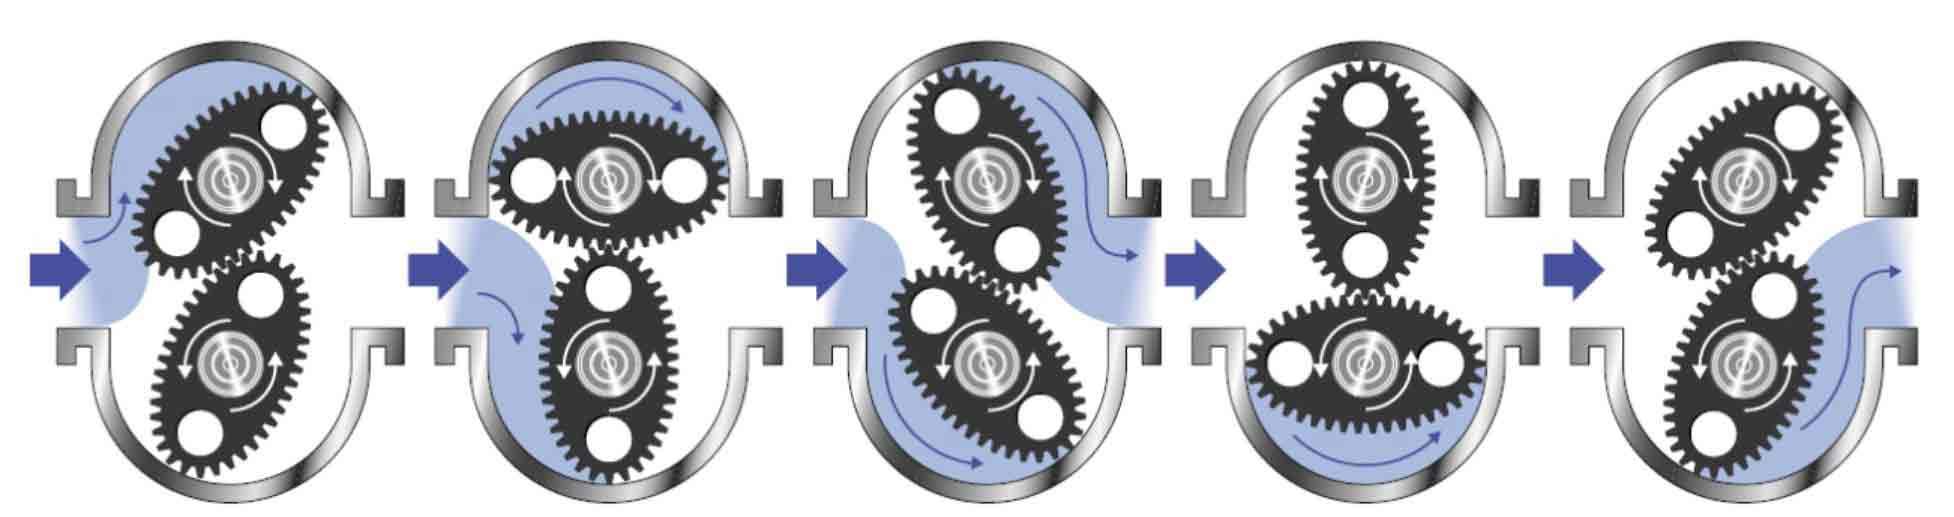 How-to-work-oval-gear-flowmeter